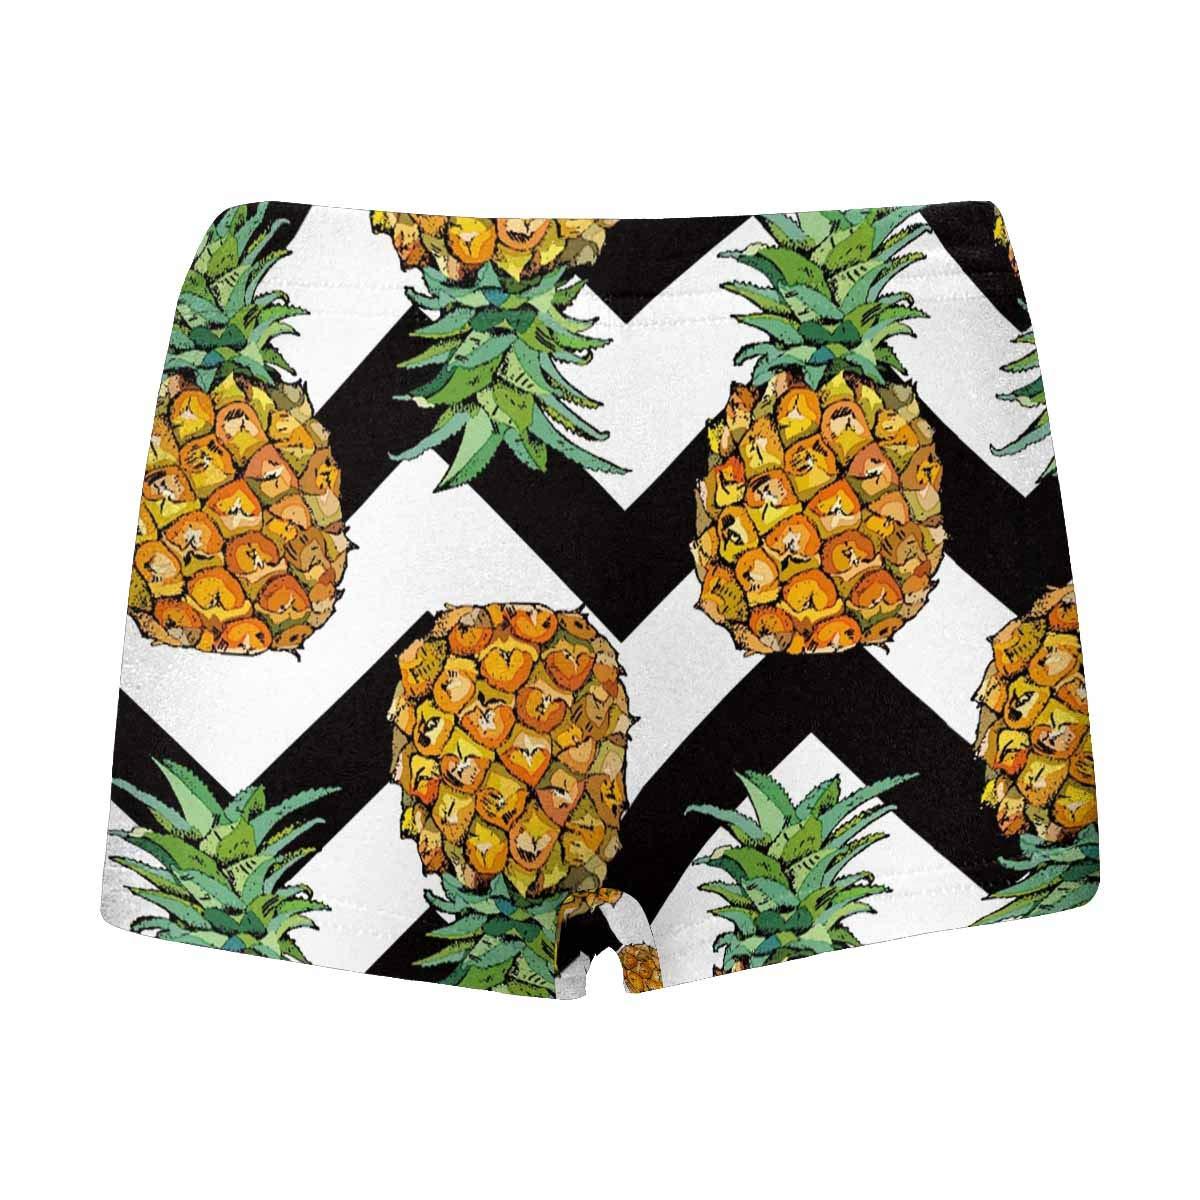 5T-2XL INTERESTPRINT Kids Pineapple Fruit Art with Chevron Pattern Comfortable Breathable Briefs